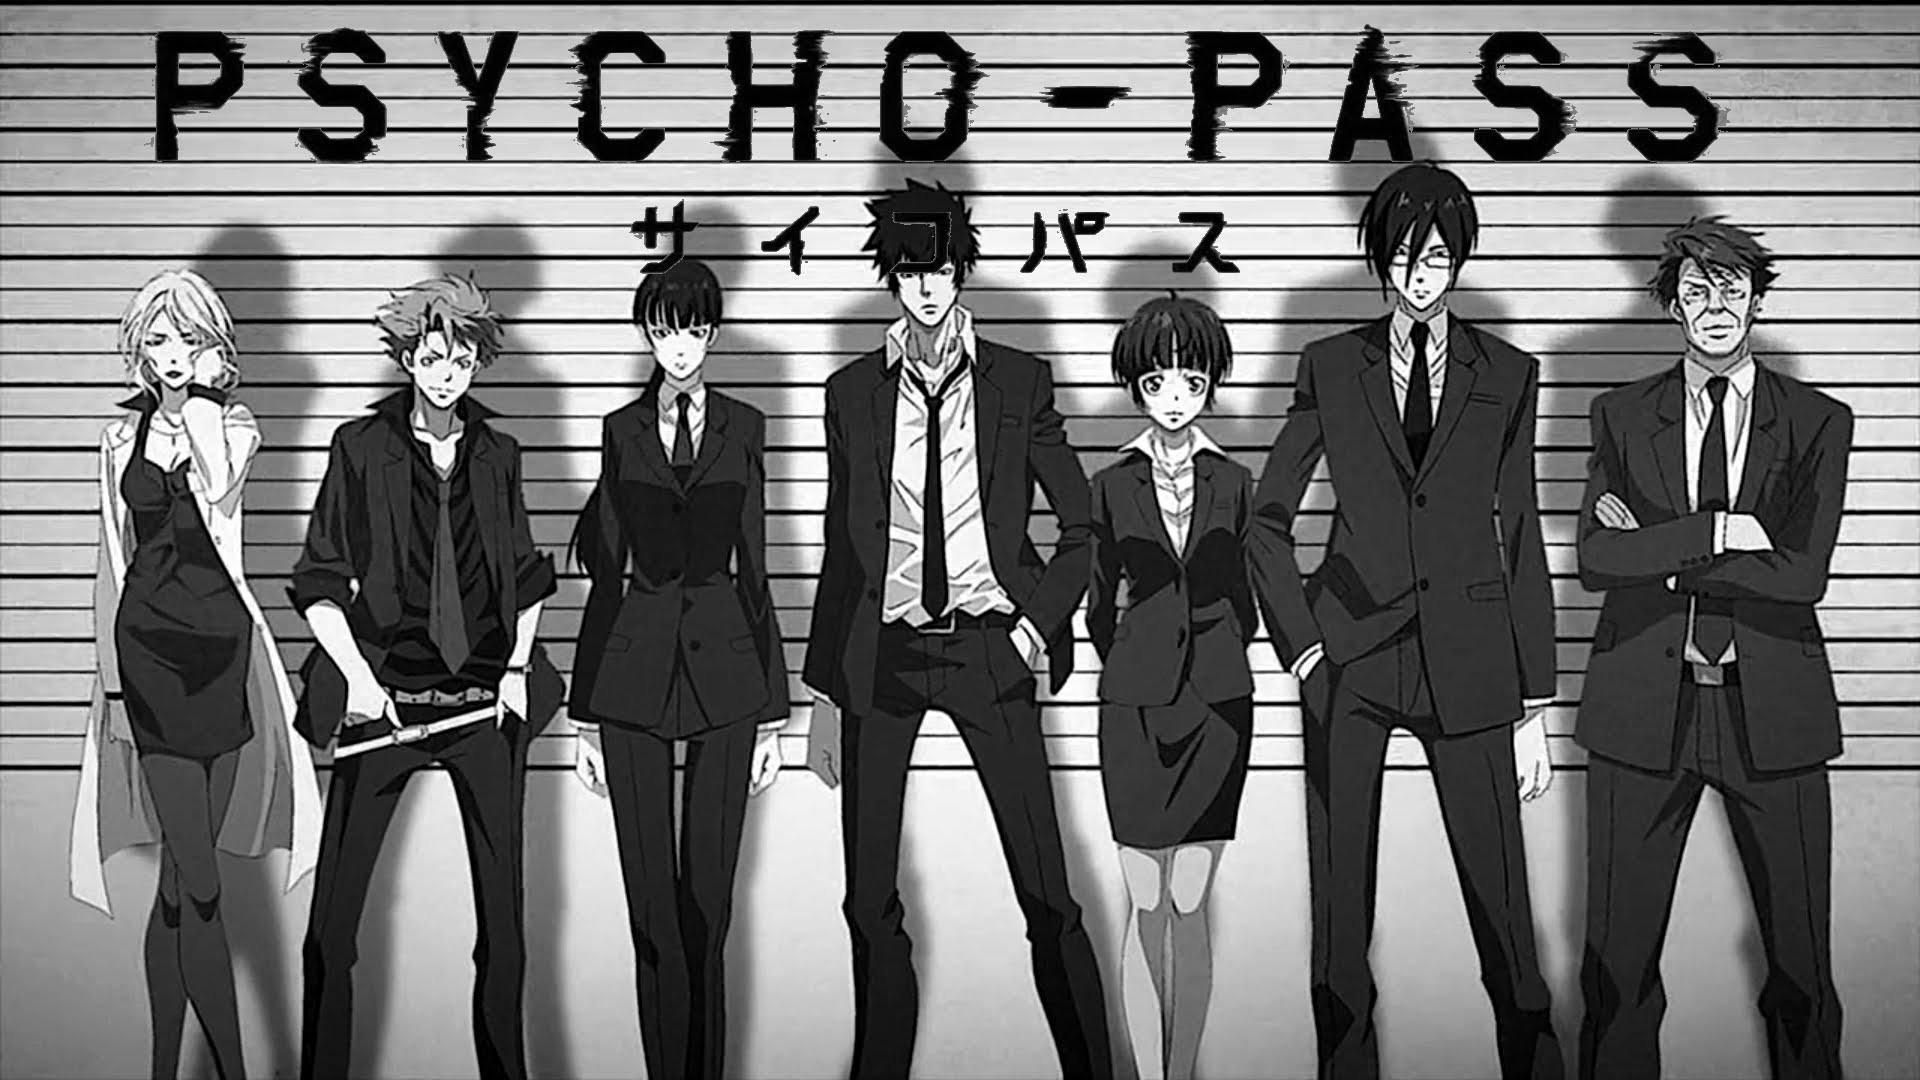 COM_247841_7A1571B6 Kamuiprofile maxresdefault (1) maxresdefault  psycho_pass_anime_shinya_akane_kogami_hd-wallpaper-1426286 …